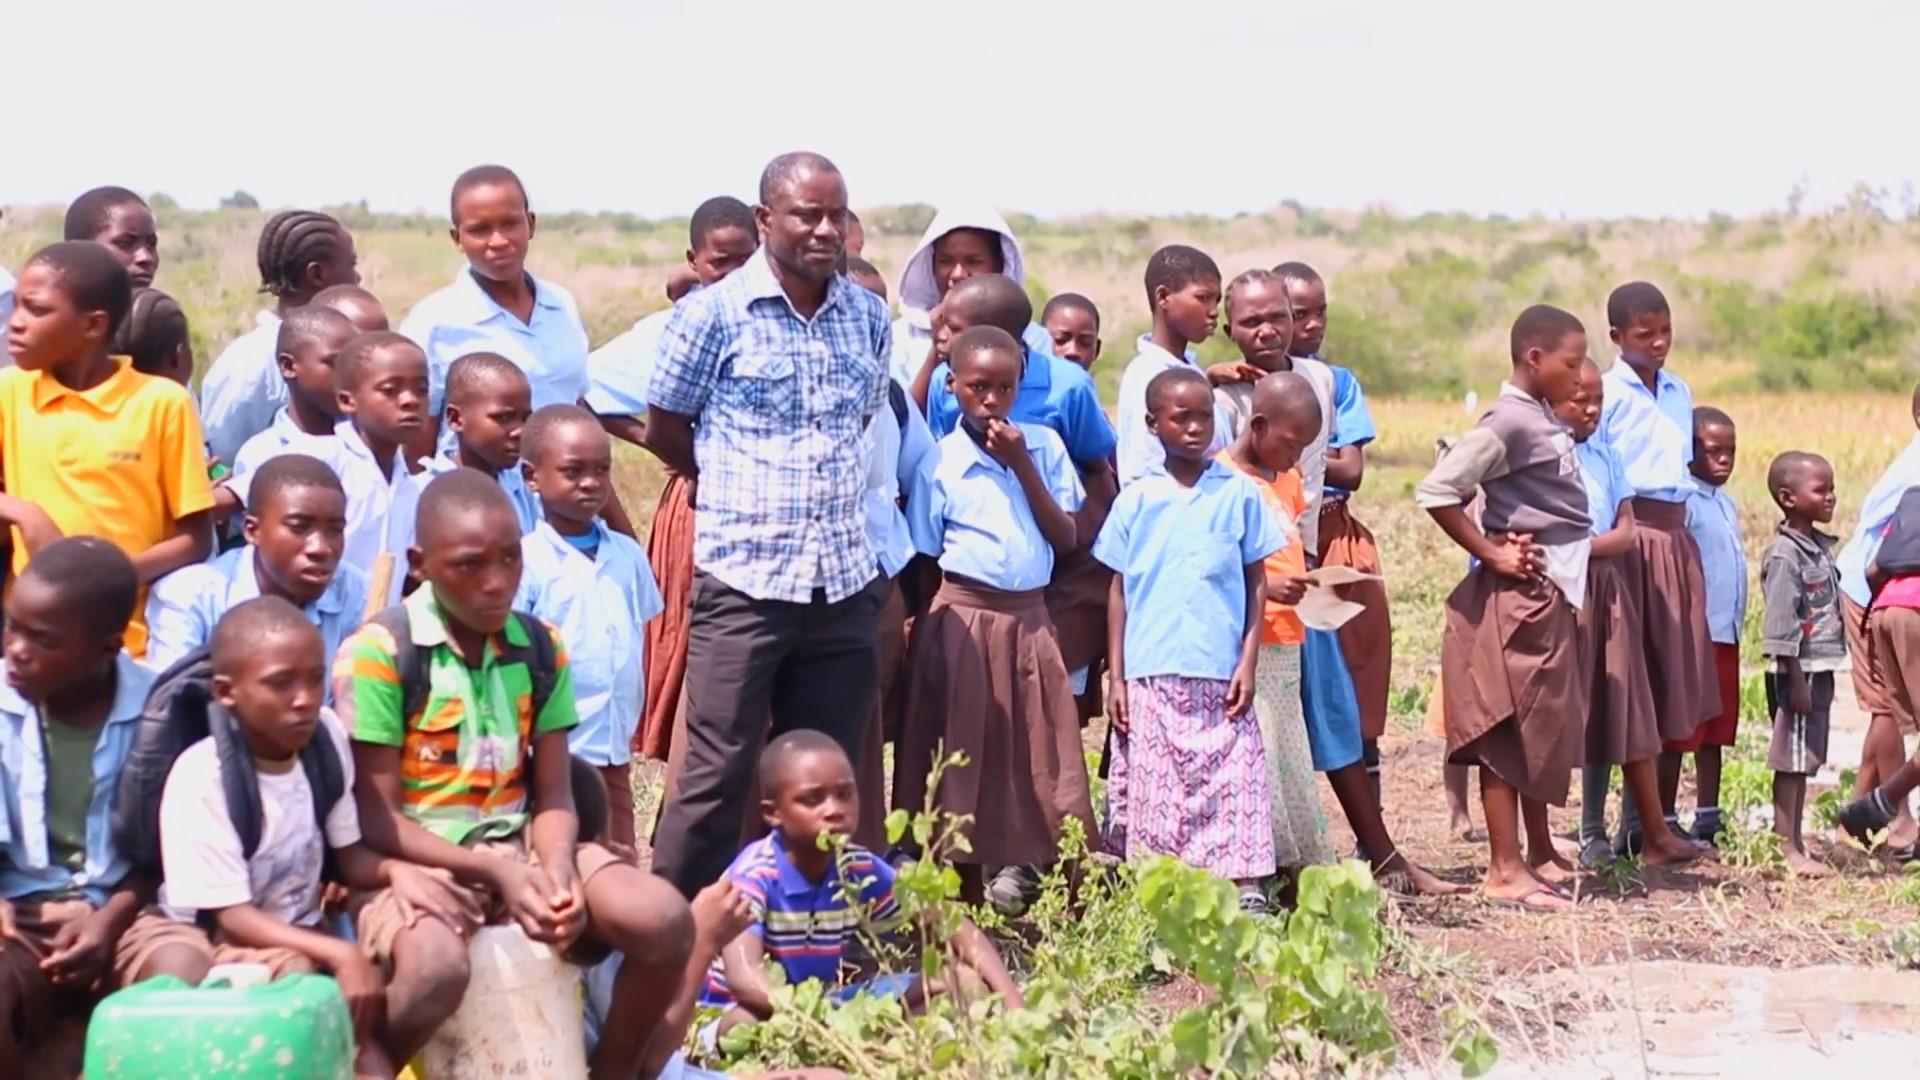 Photo of Emmanuel Baya teaching organic farming techniques to children in his care.